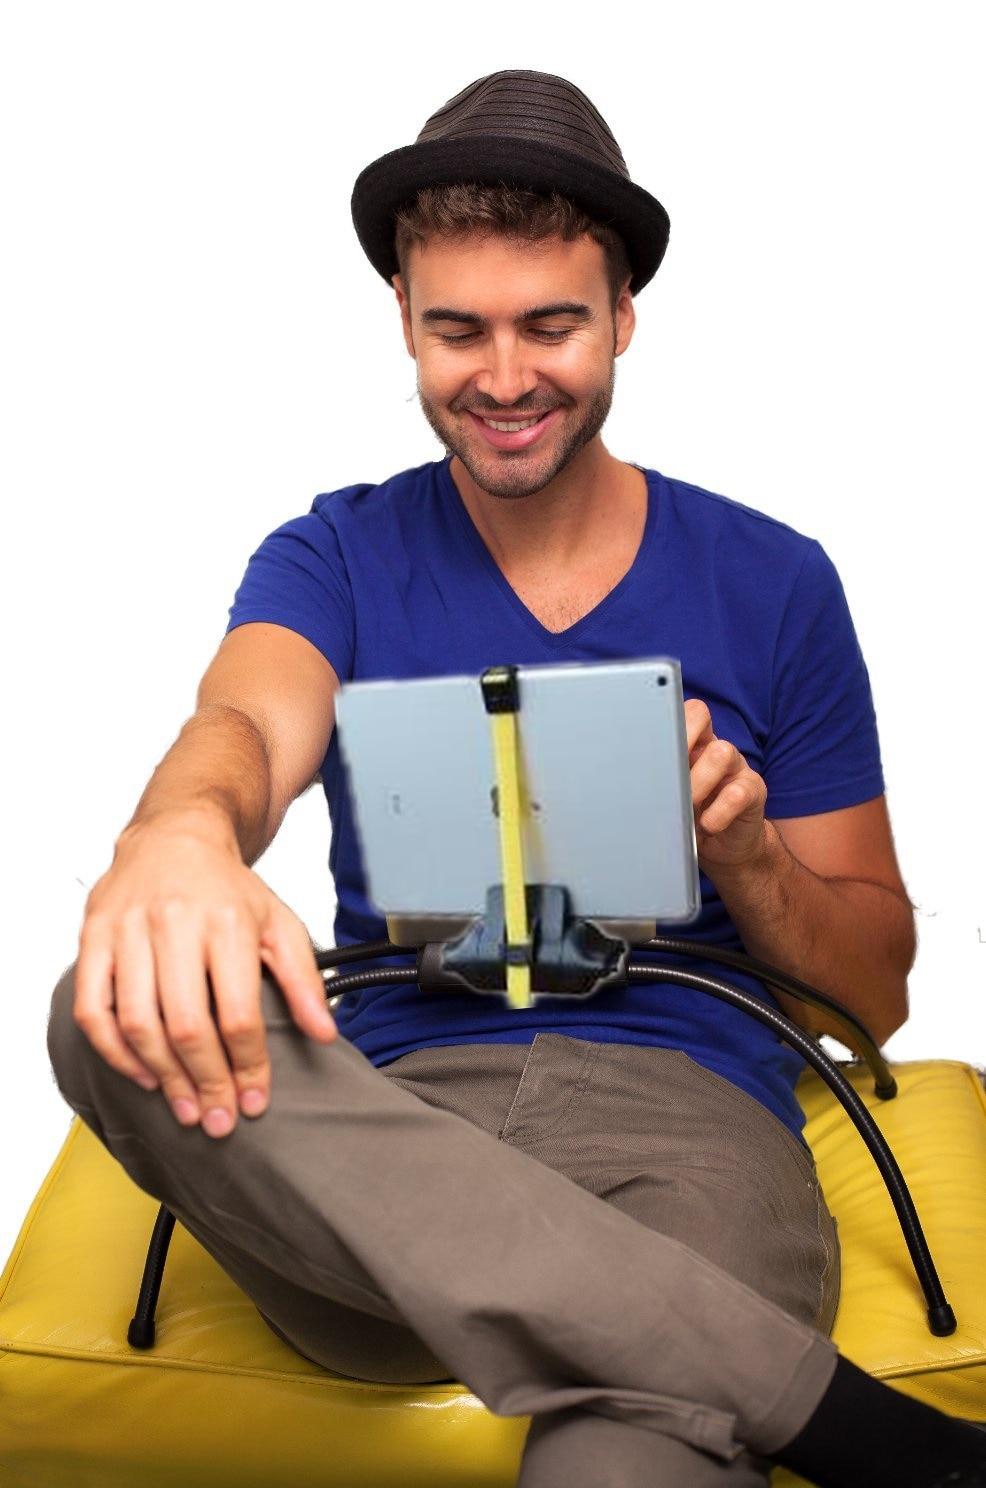 Bed-Tablet-Stand-Flexible-Spider-Lazy-Bracket-Angle-Adjustable-Mobile-Phone-Folding-Holder-for-Bed-Sofa (1)